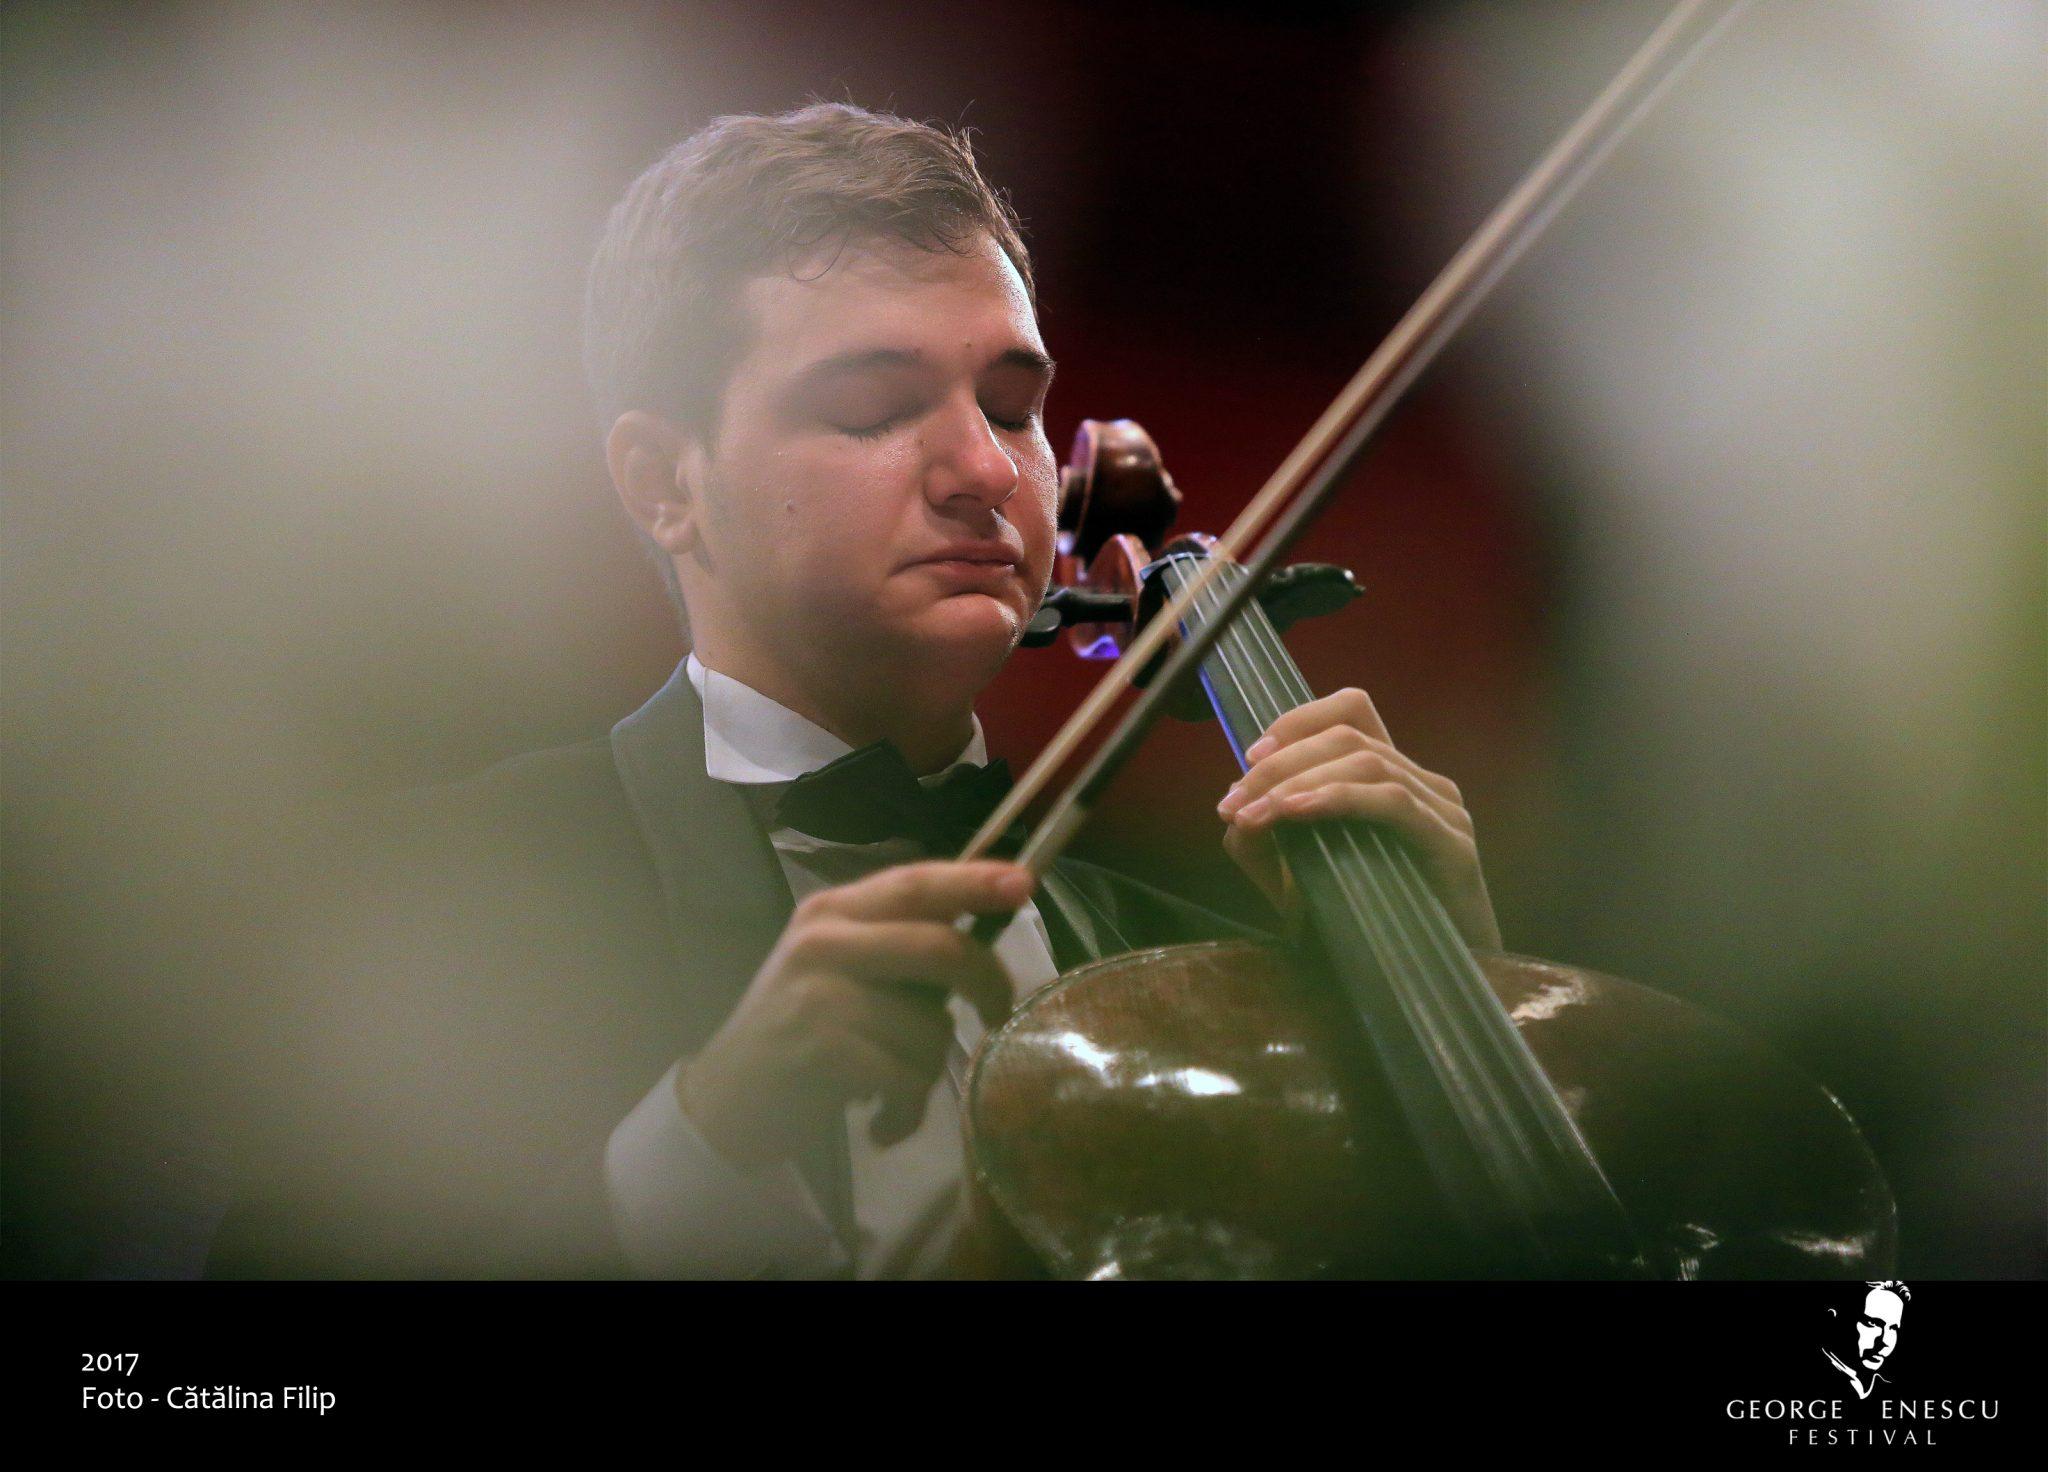 10 sept - Munchner Philharmoniker_Gergiev_Ionita17 - Catalina Filip